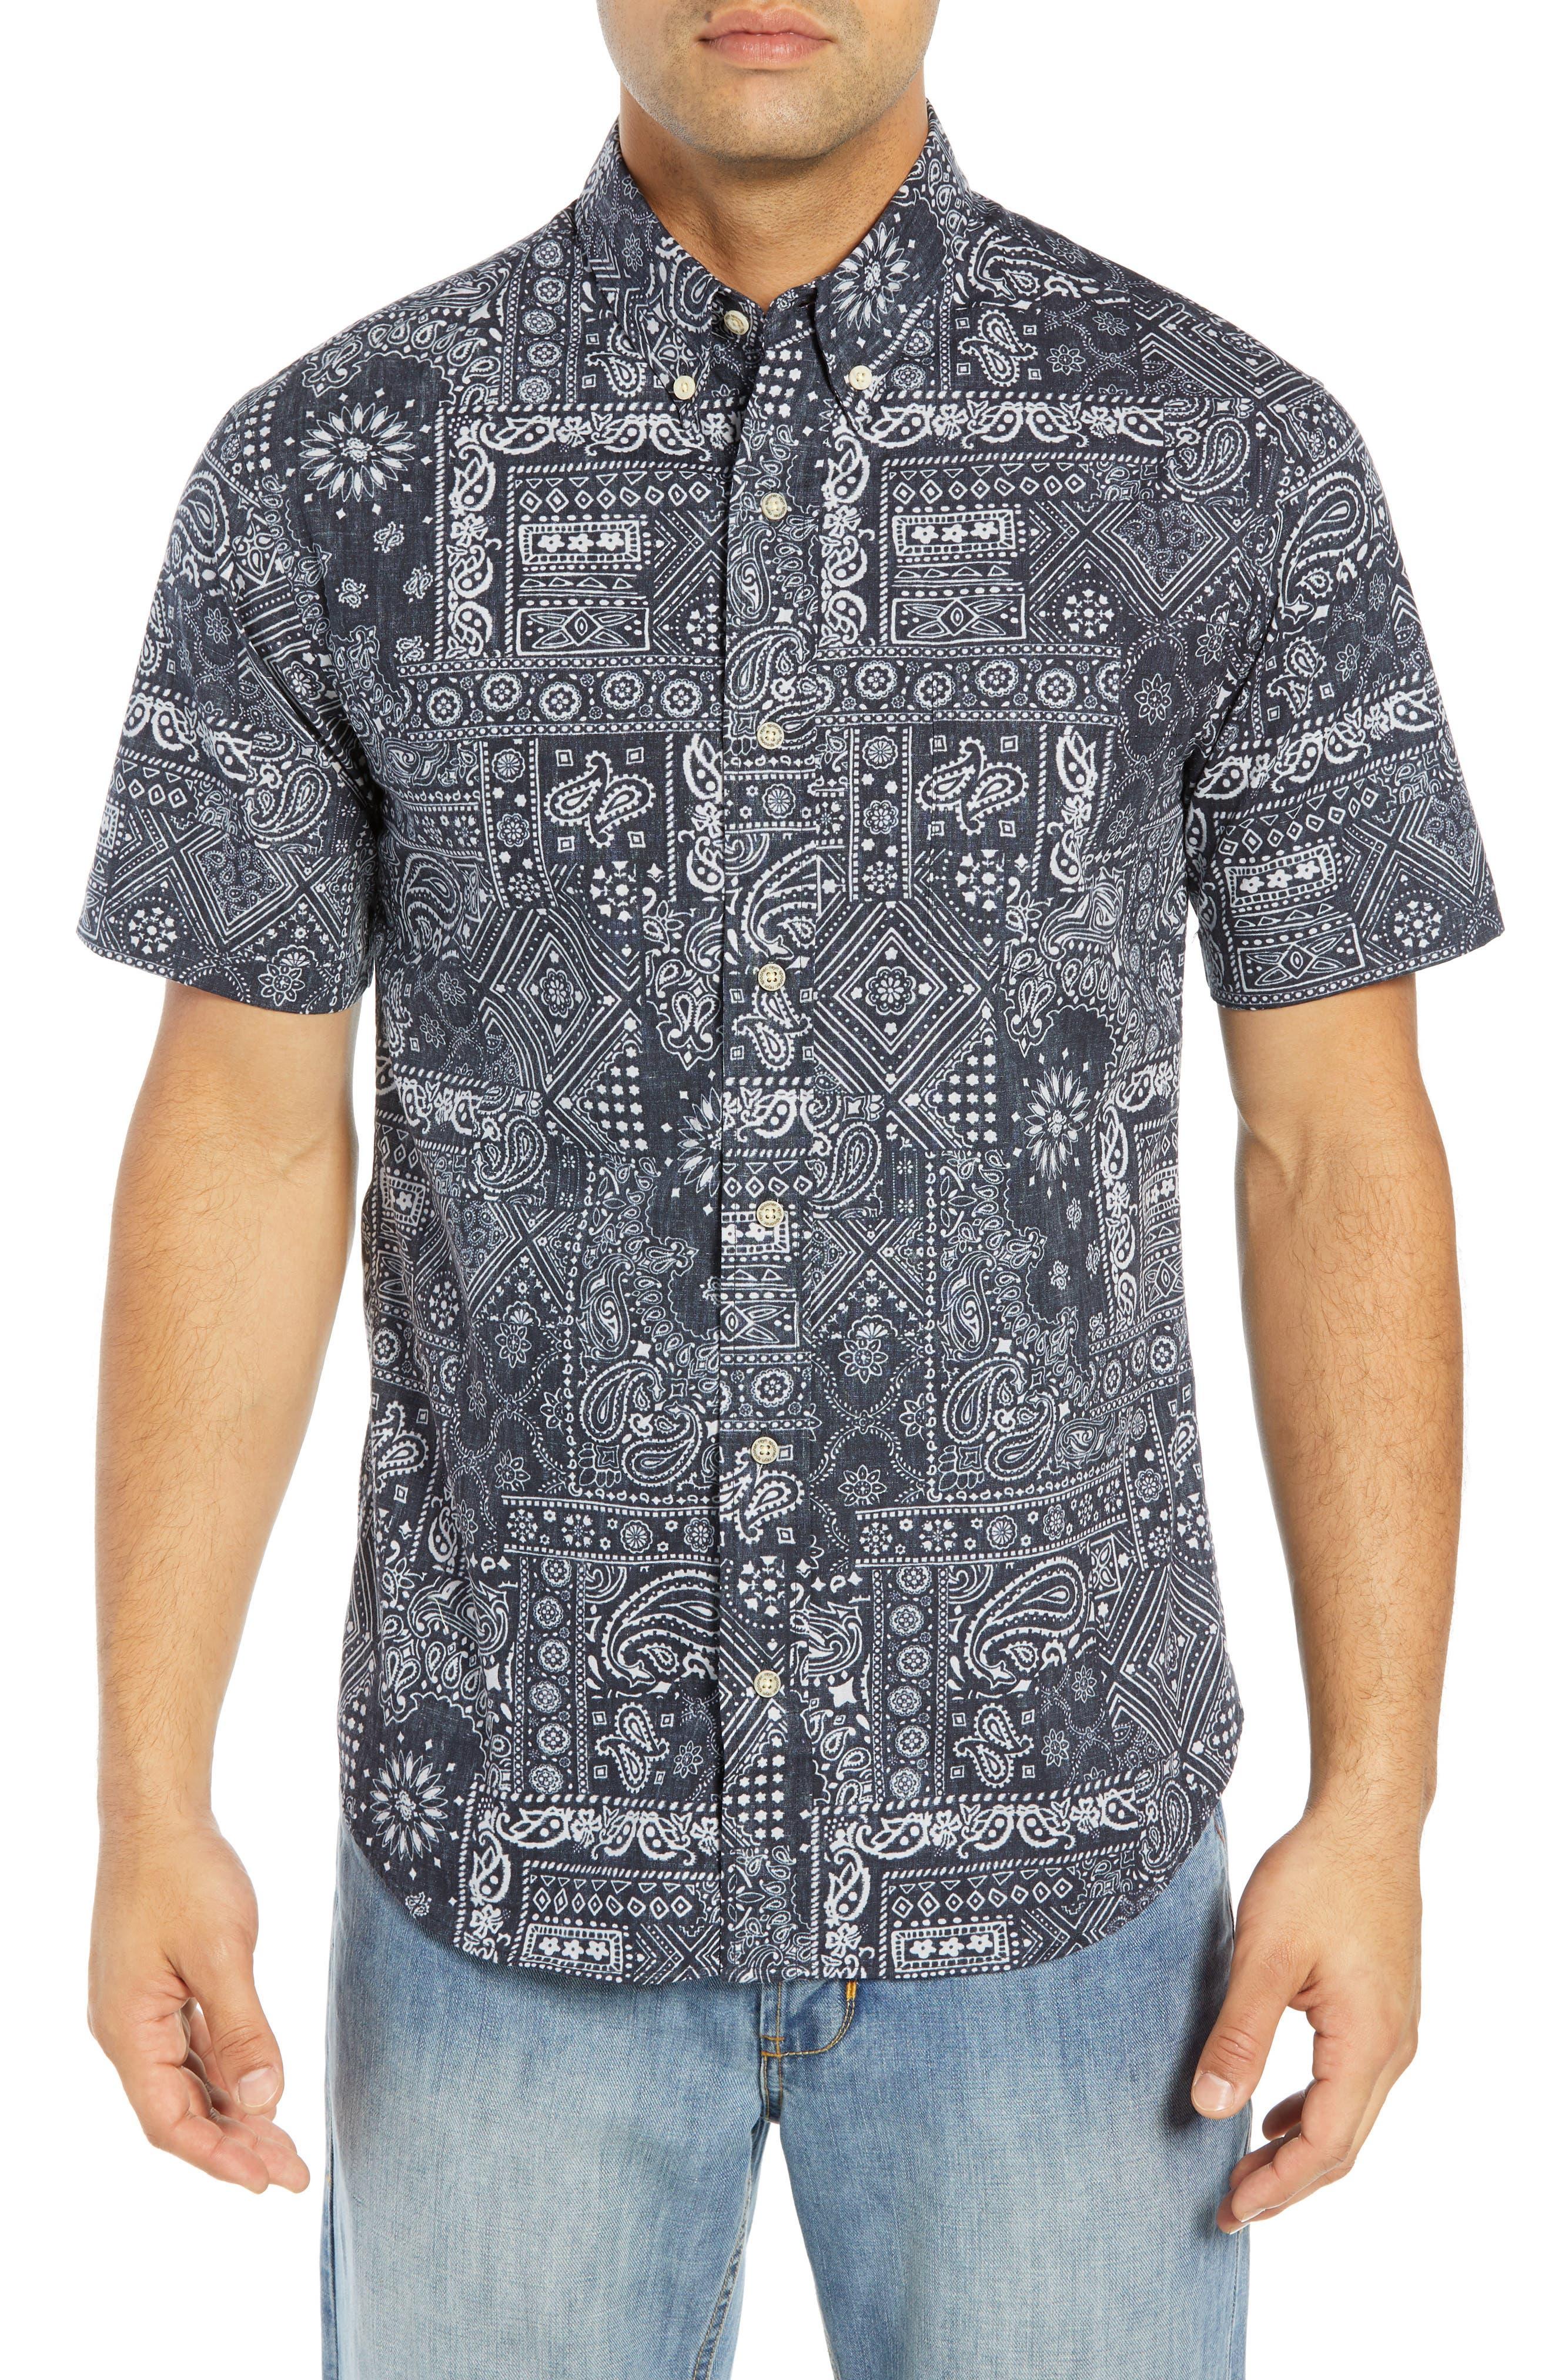 REYN SPOONER Aloha Bandana Regular Fit Sport Shirt, Main, color, 001